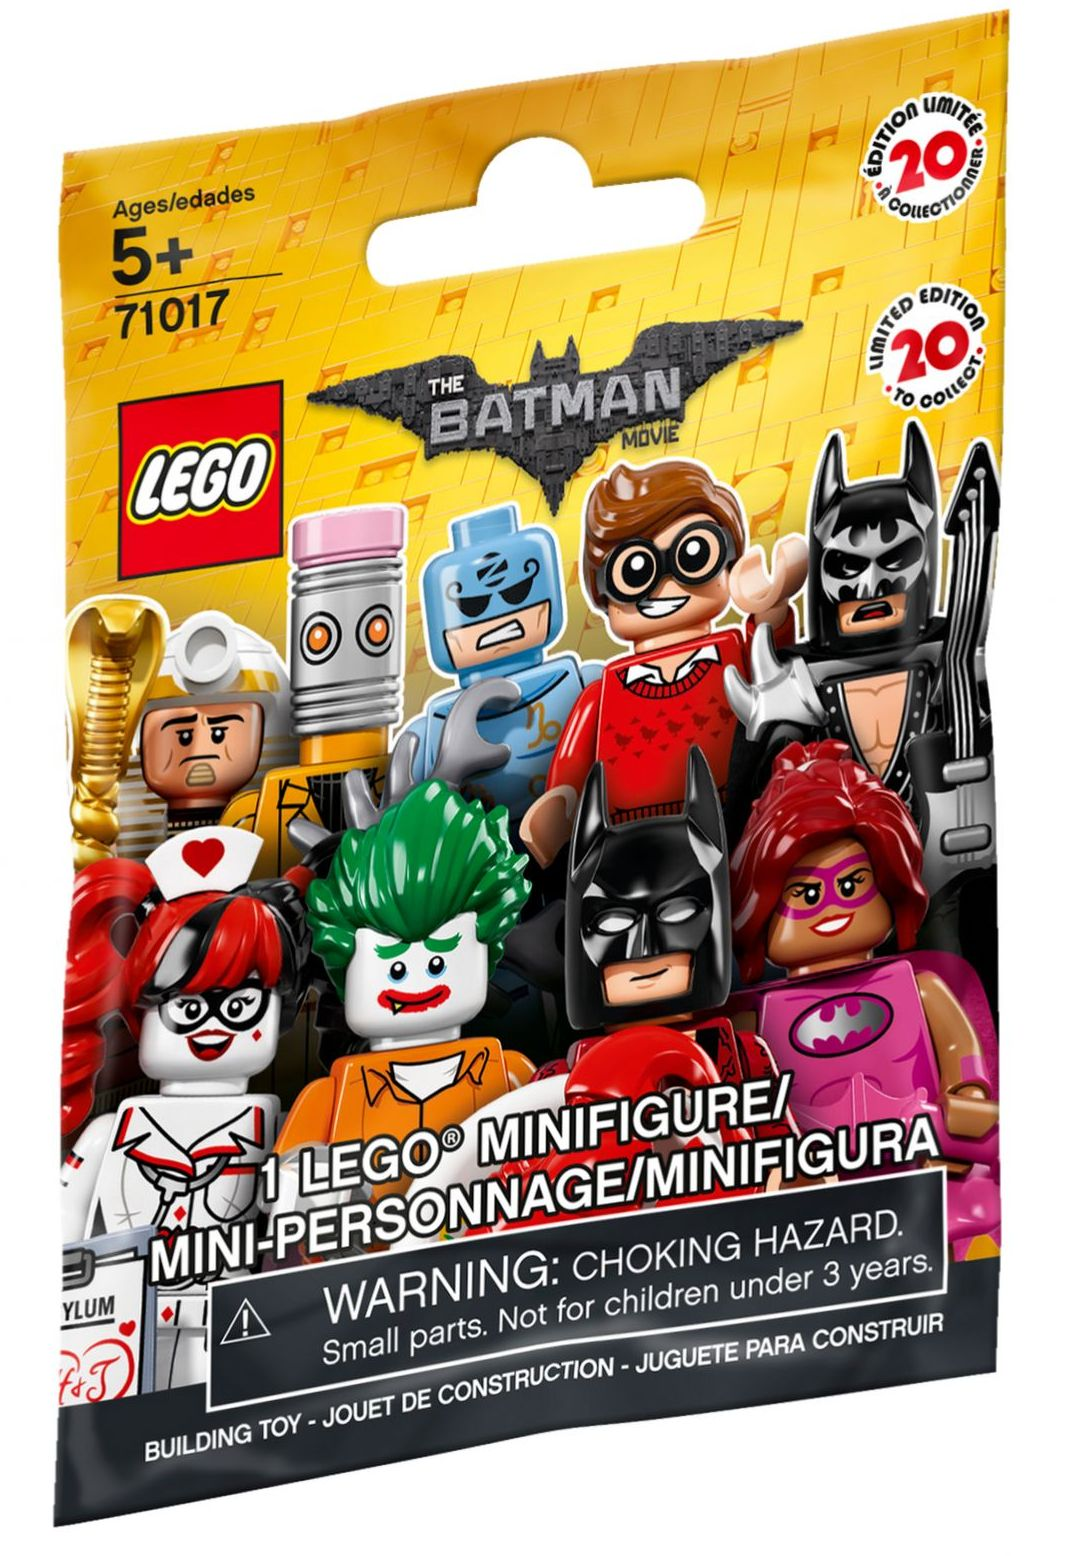 Pink Power Batgirl minifigure Factory Sealed! New Lego Batman Movie series